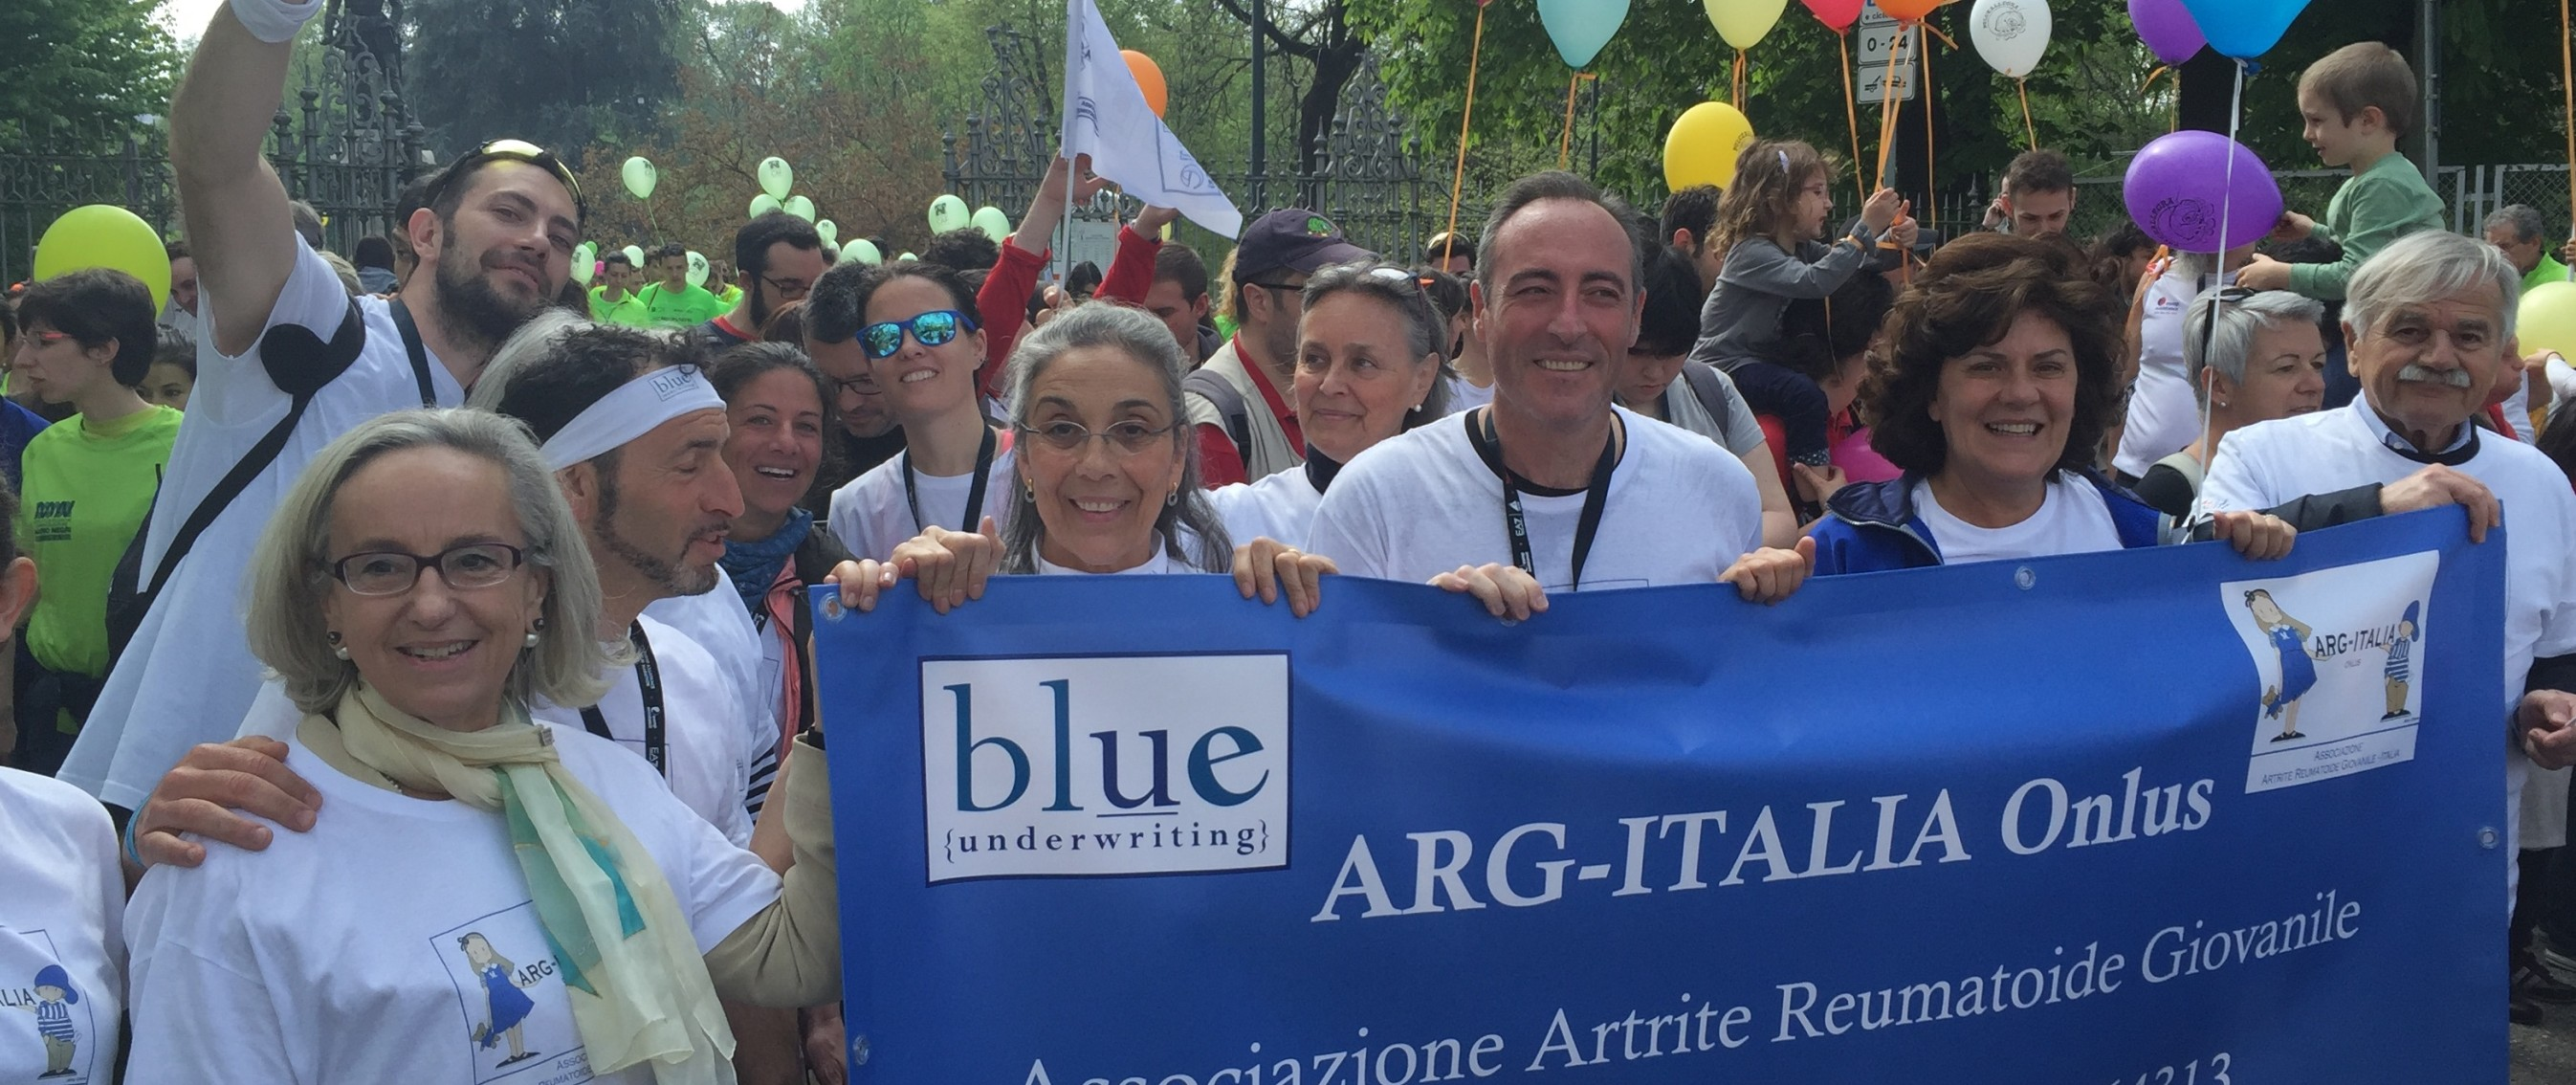 COMBATTIAMO INSIEME L'UVEITE DEI BAMBINI-Lucrezia Cristina Caroli